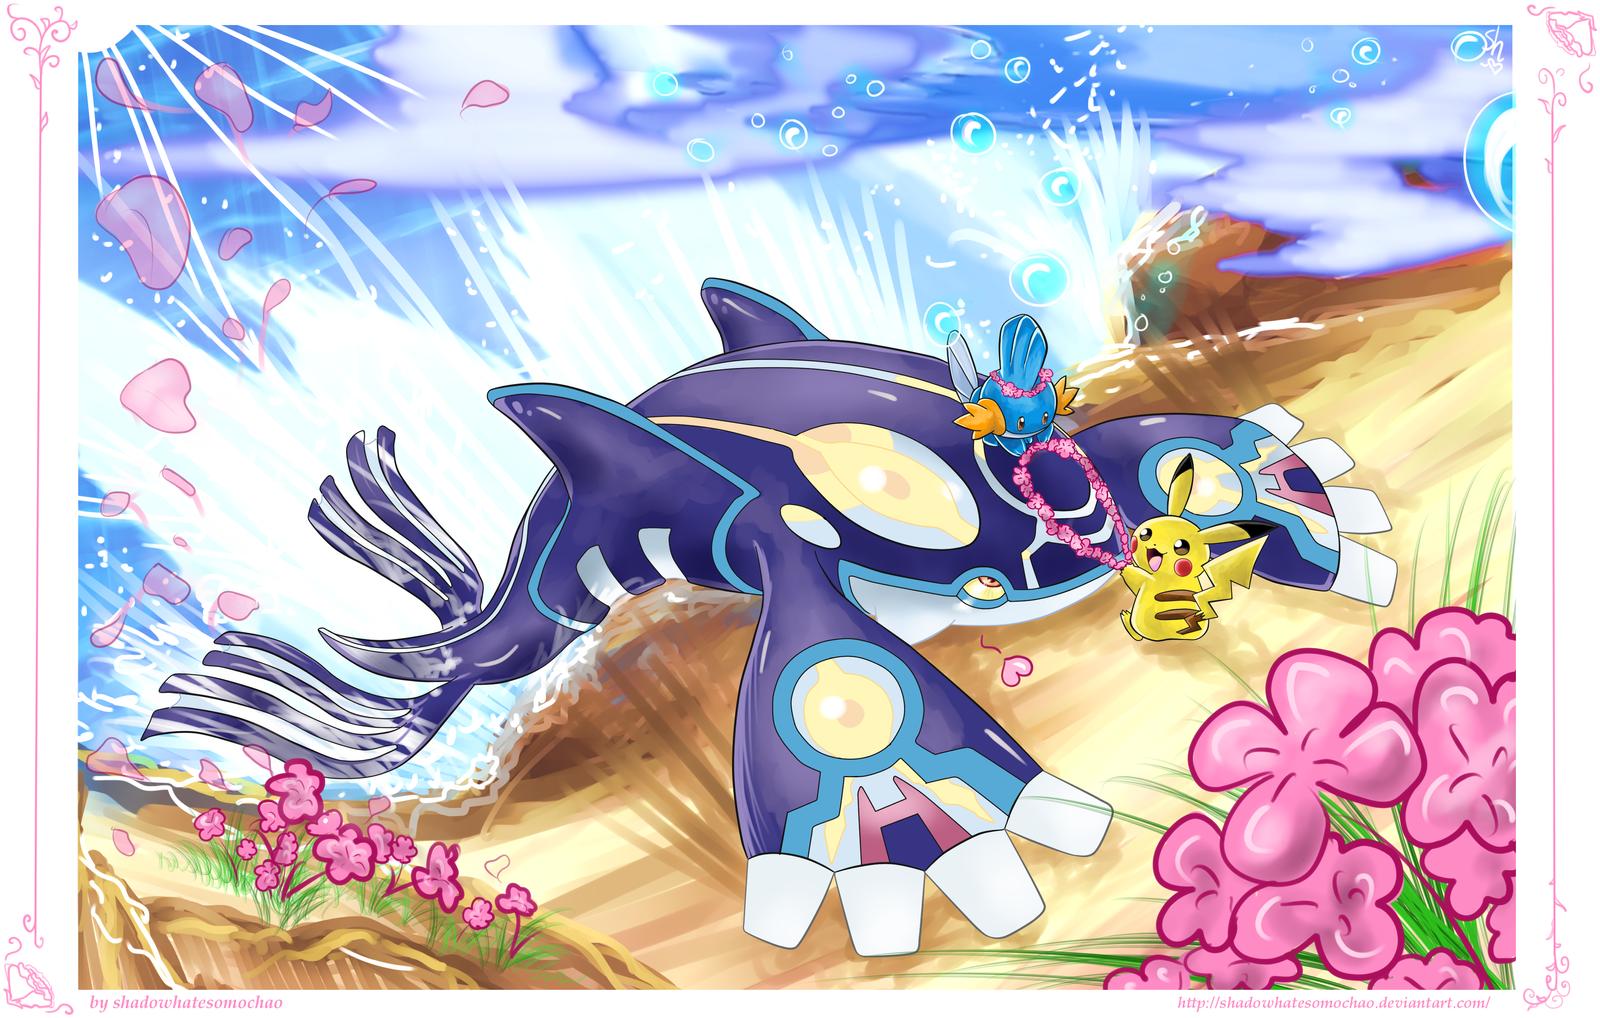 Pokemon Alpha Sapphire: Flowerfun by shadowhatesomochao